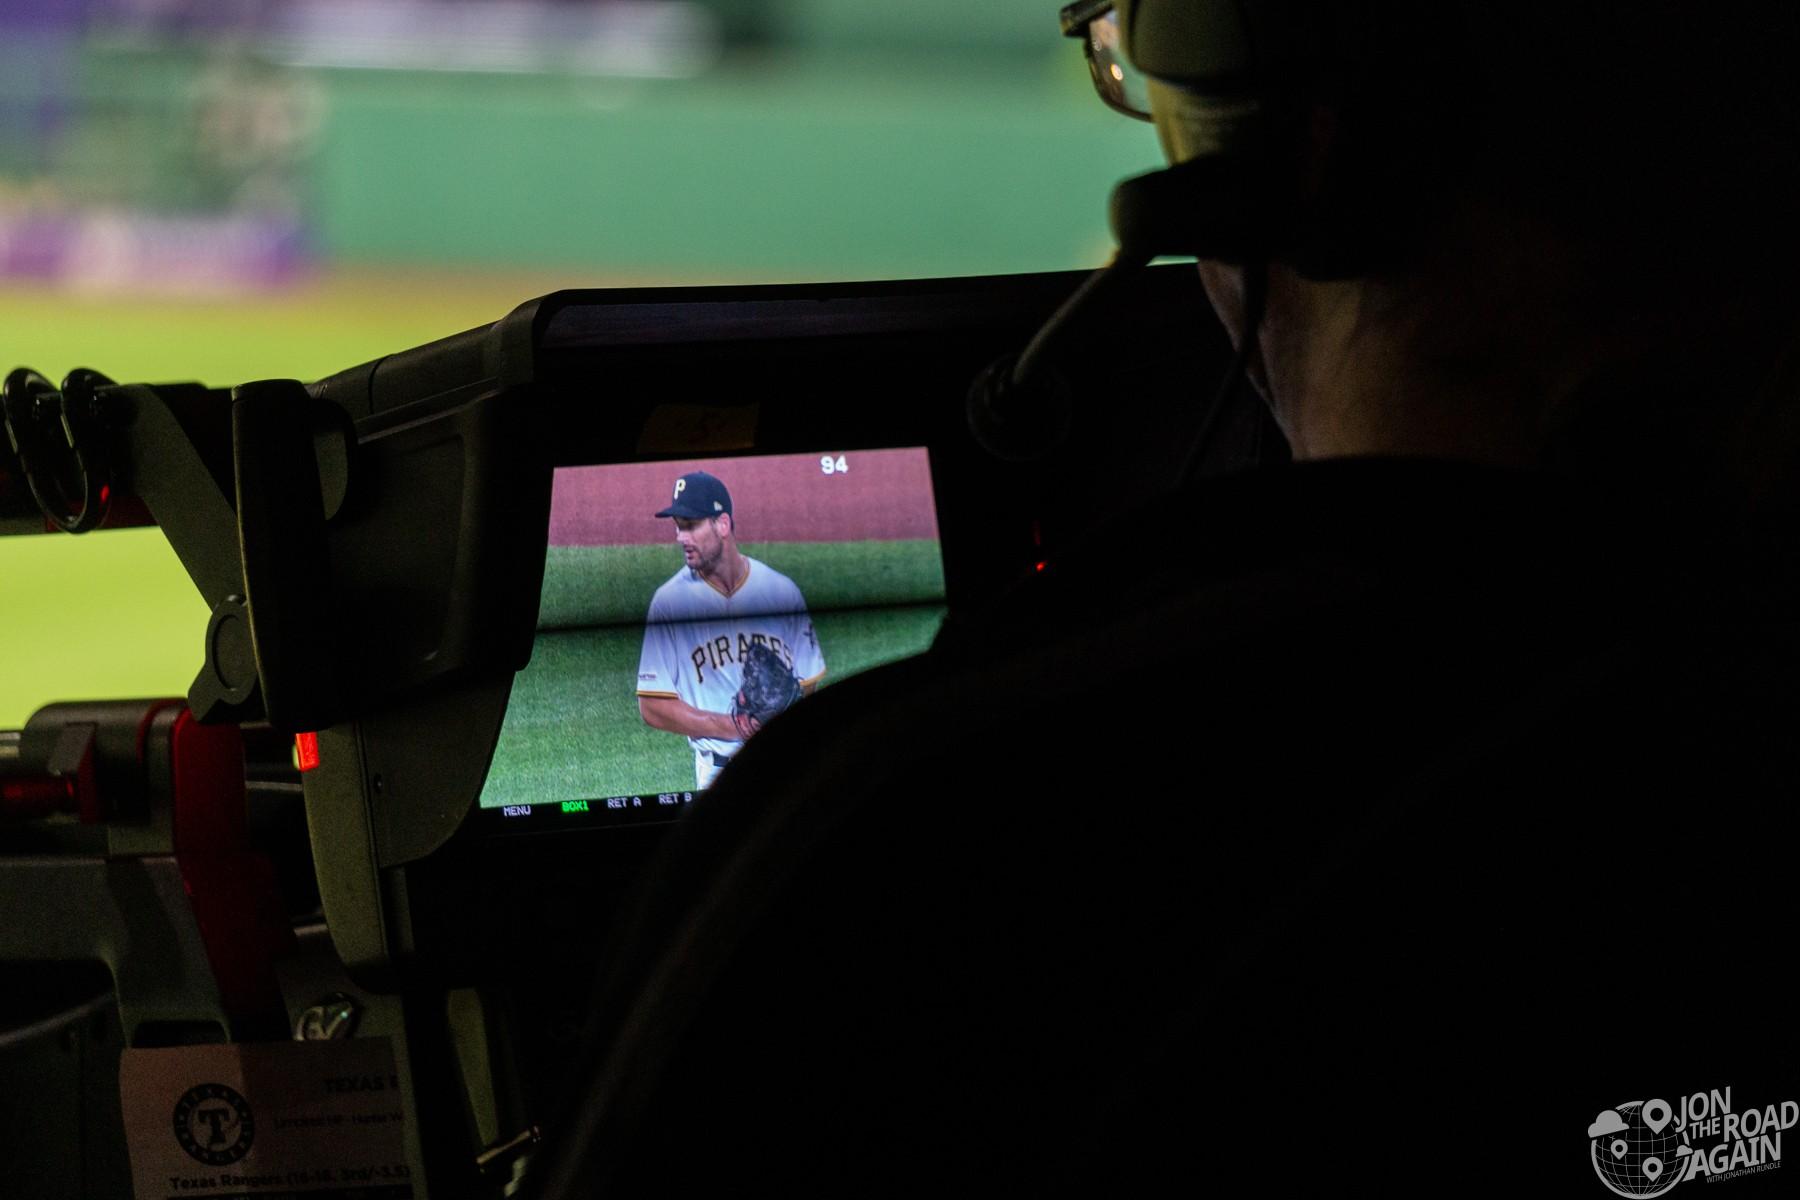 TV camera baseball